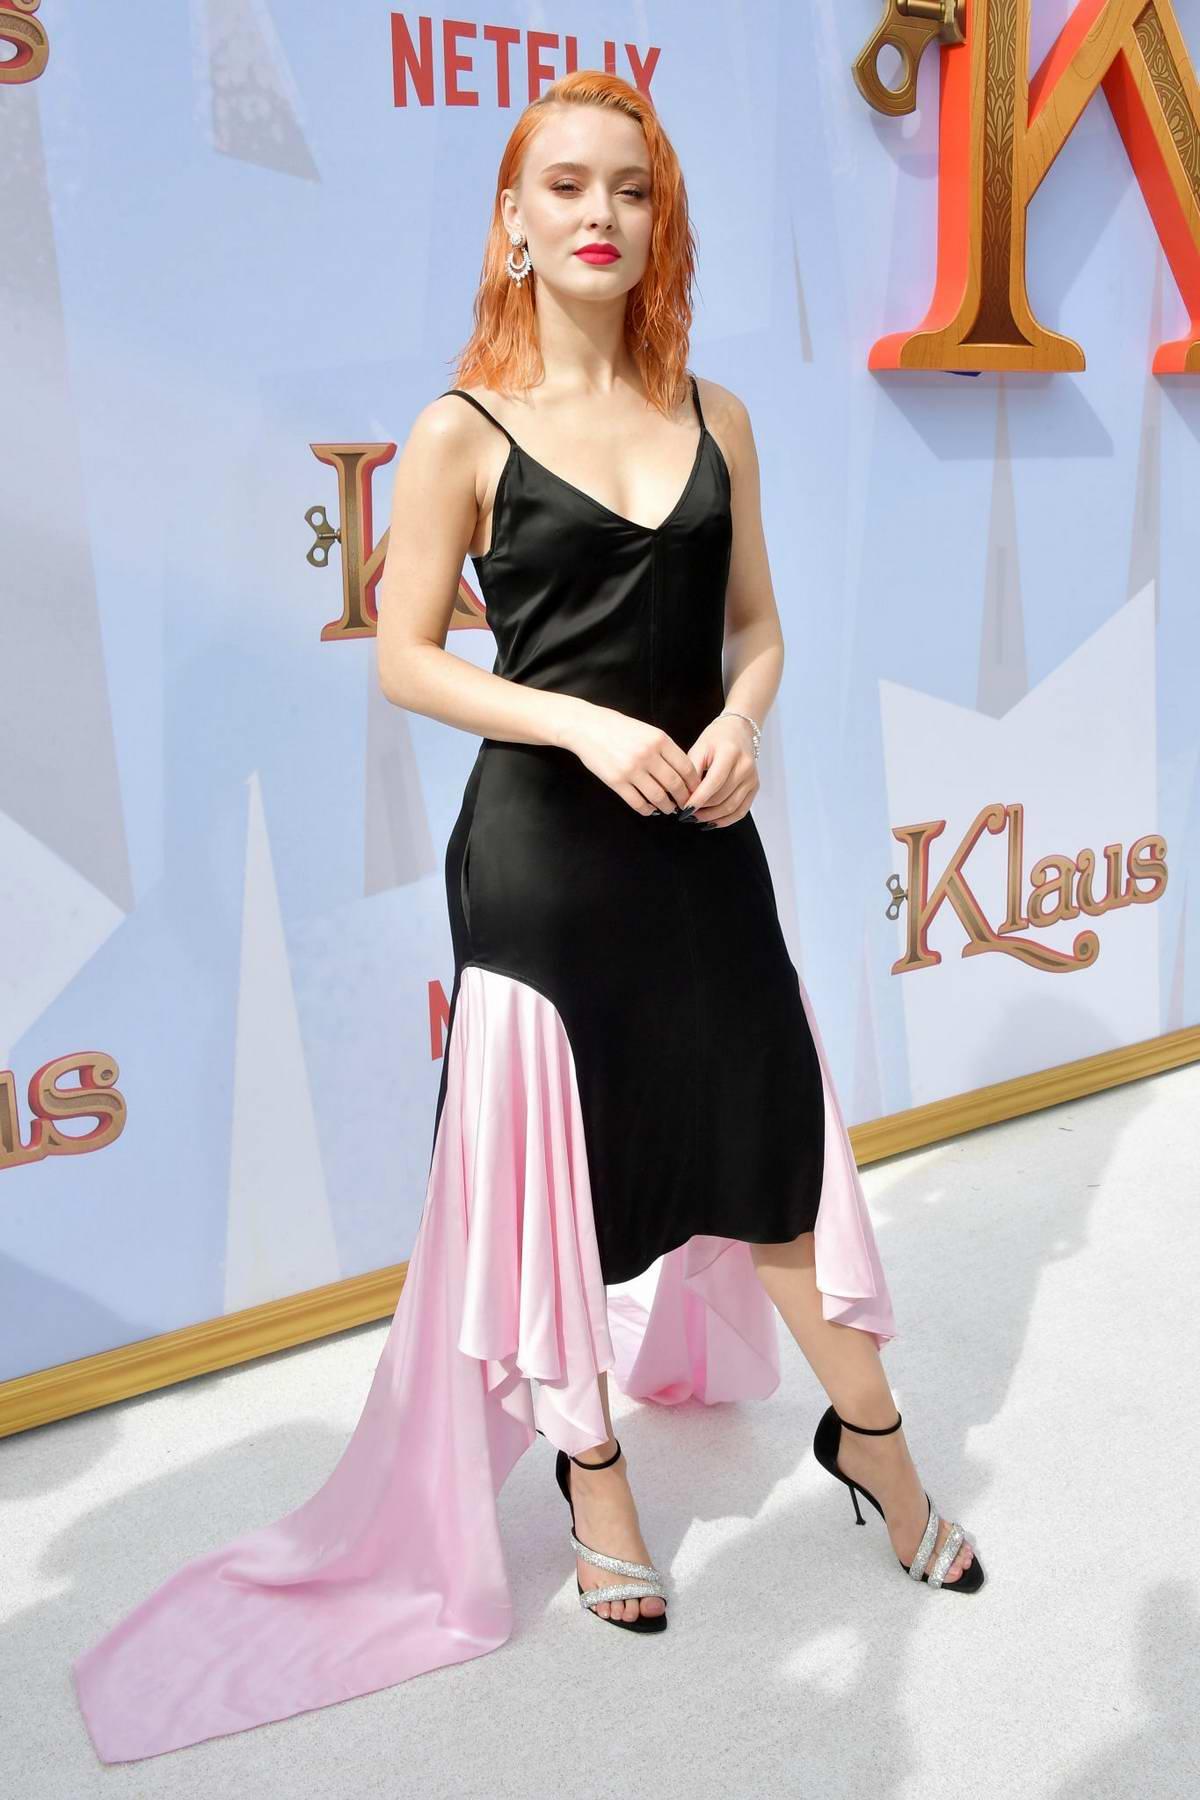 Zara Larsson attends the premiere of Netflix's 'Klaus' at Regency Village Theatre in Westwood, California